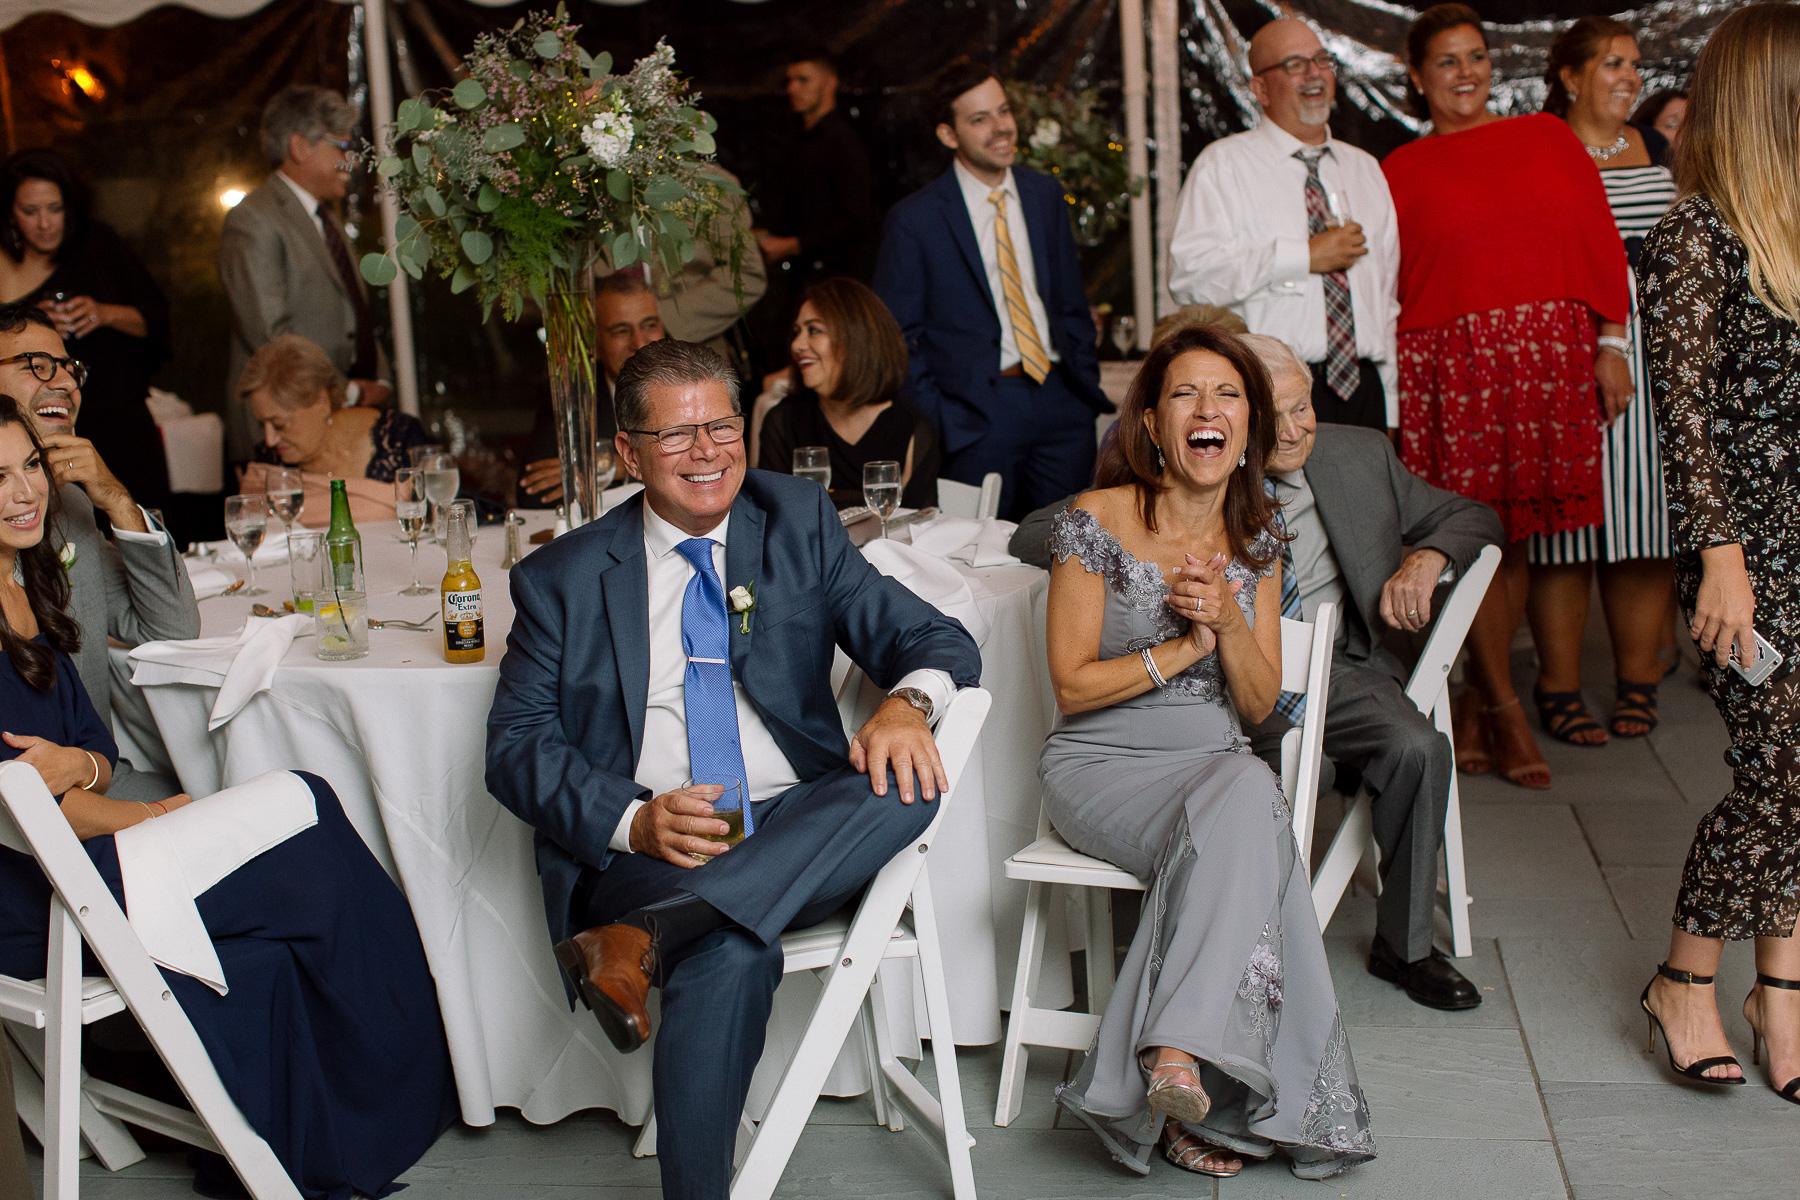 long island wedding photographer candid nontraditional non-cheesy